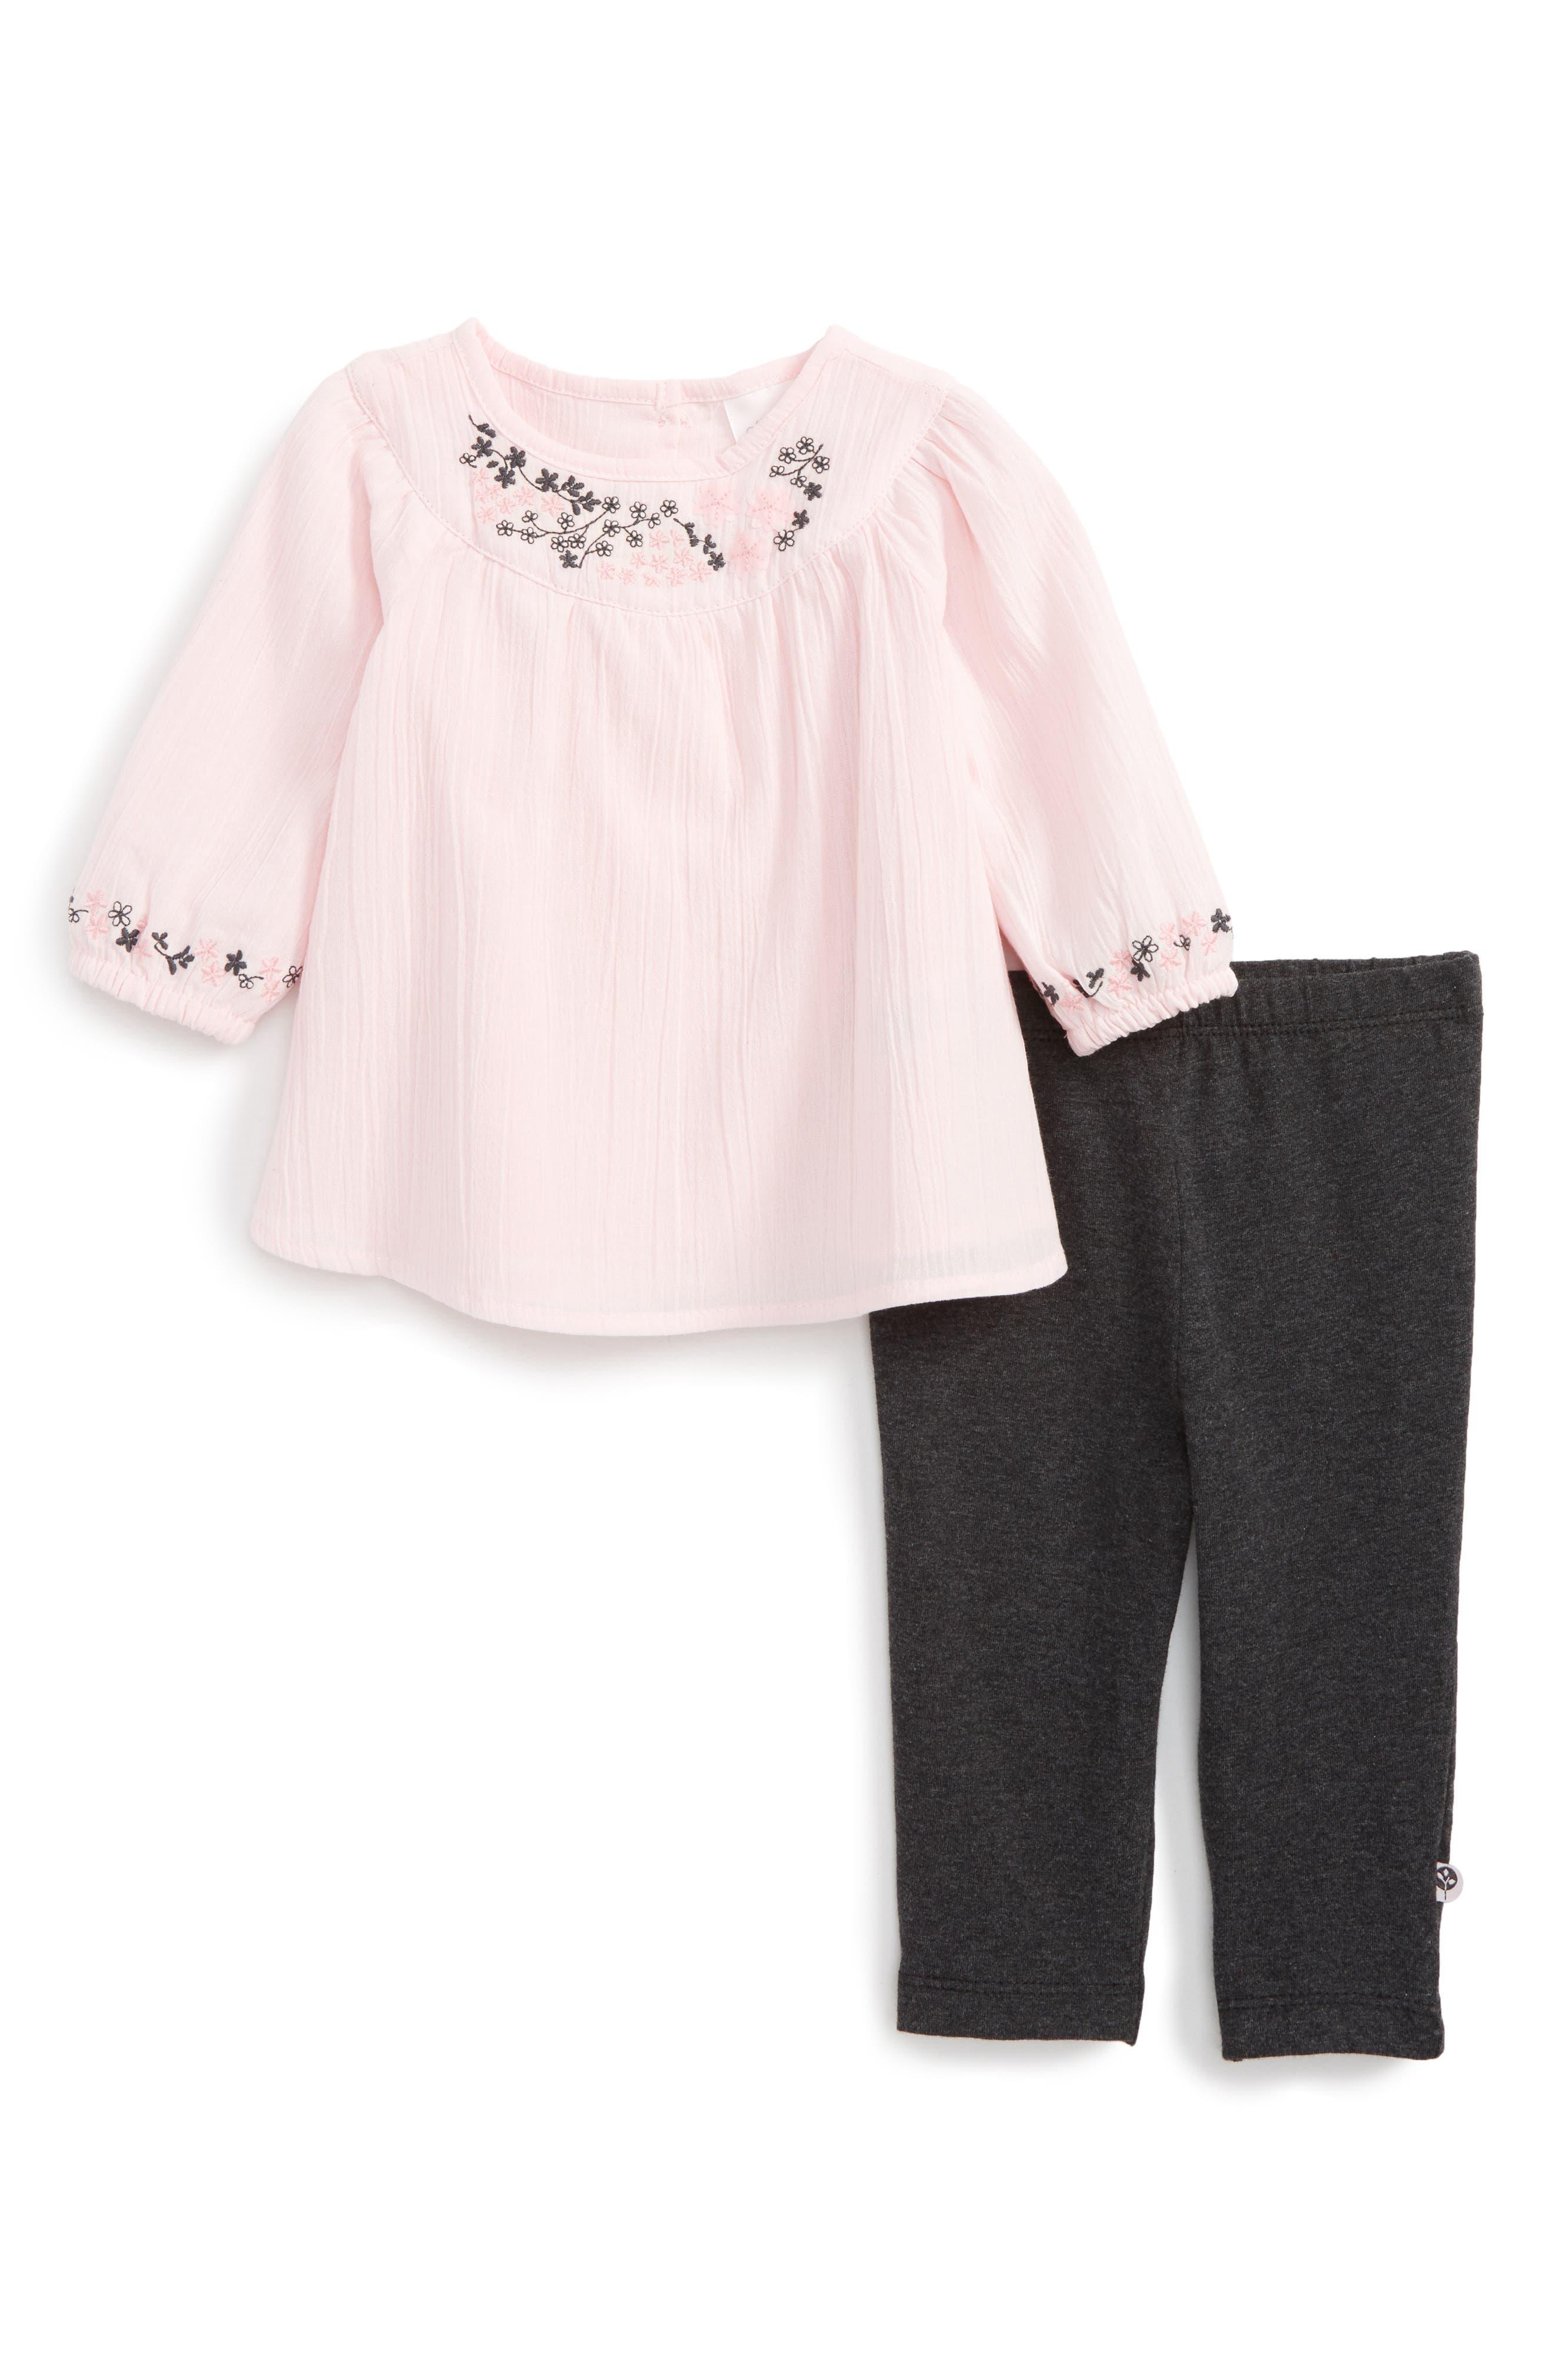 Offspring Embroidered Tunic & Leggings Set (Baby Girls)